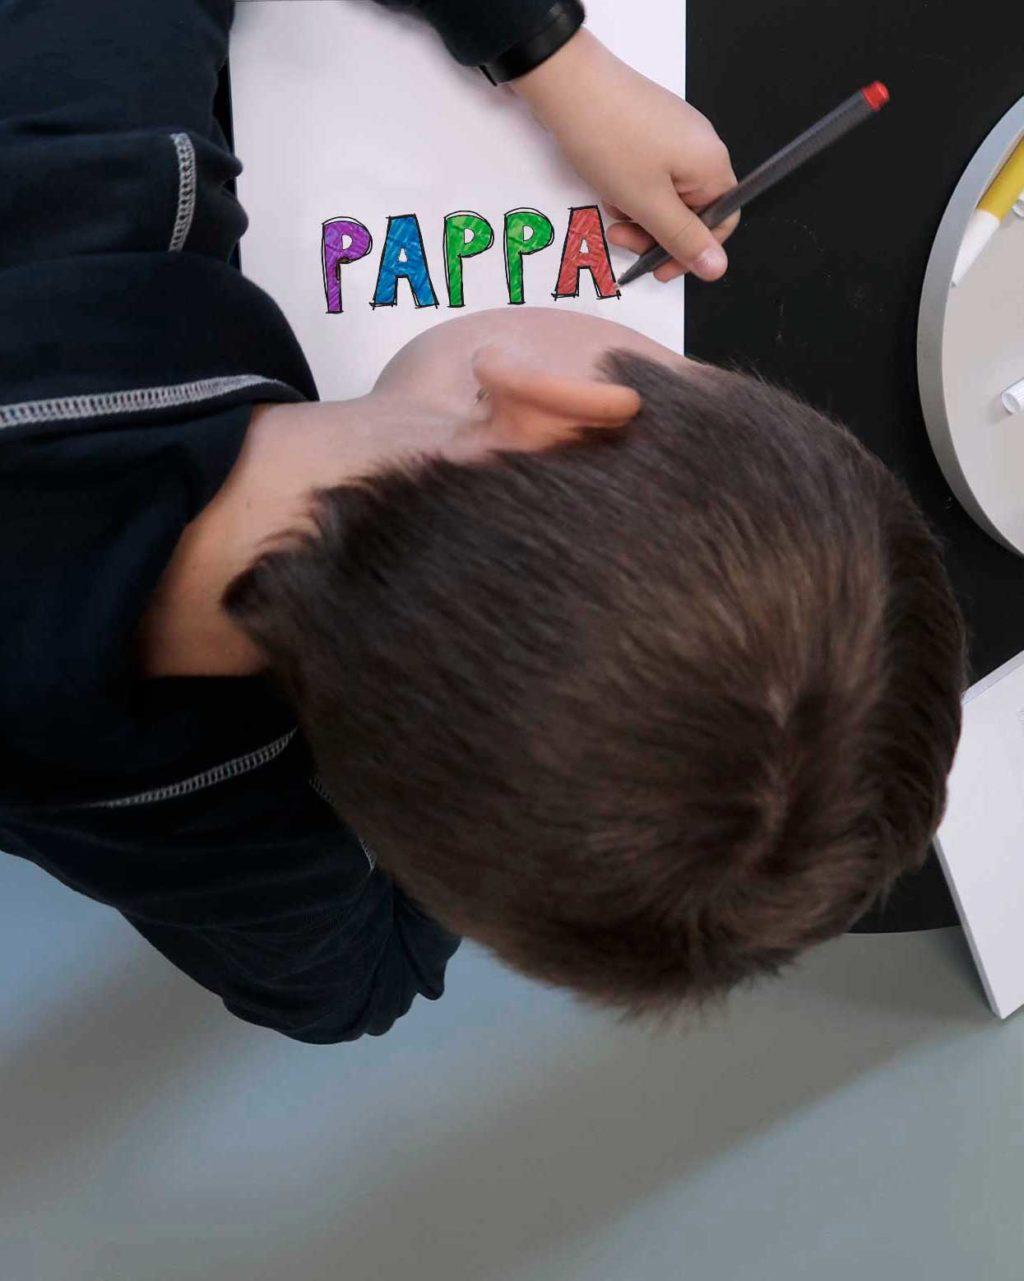 Tegneblokk pappa